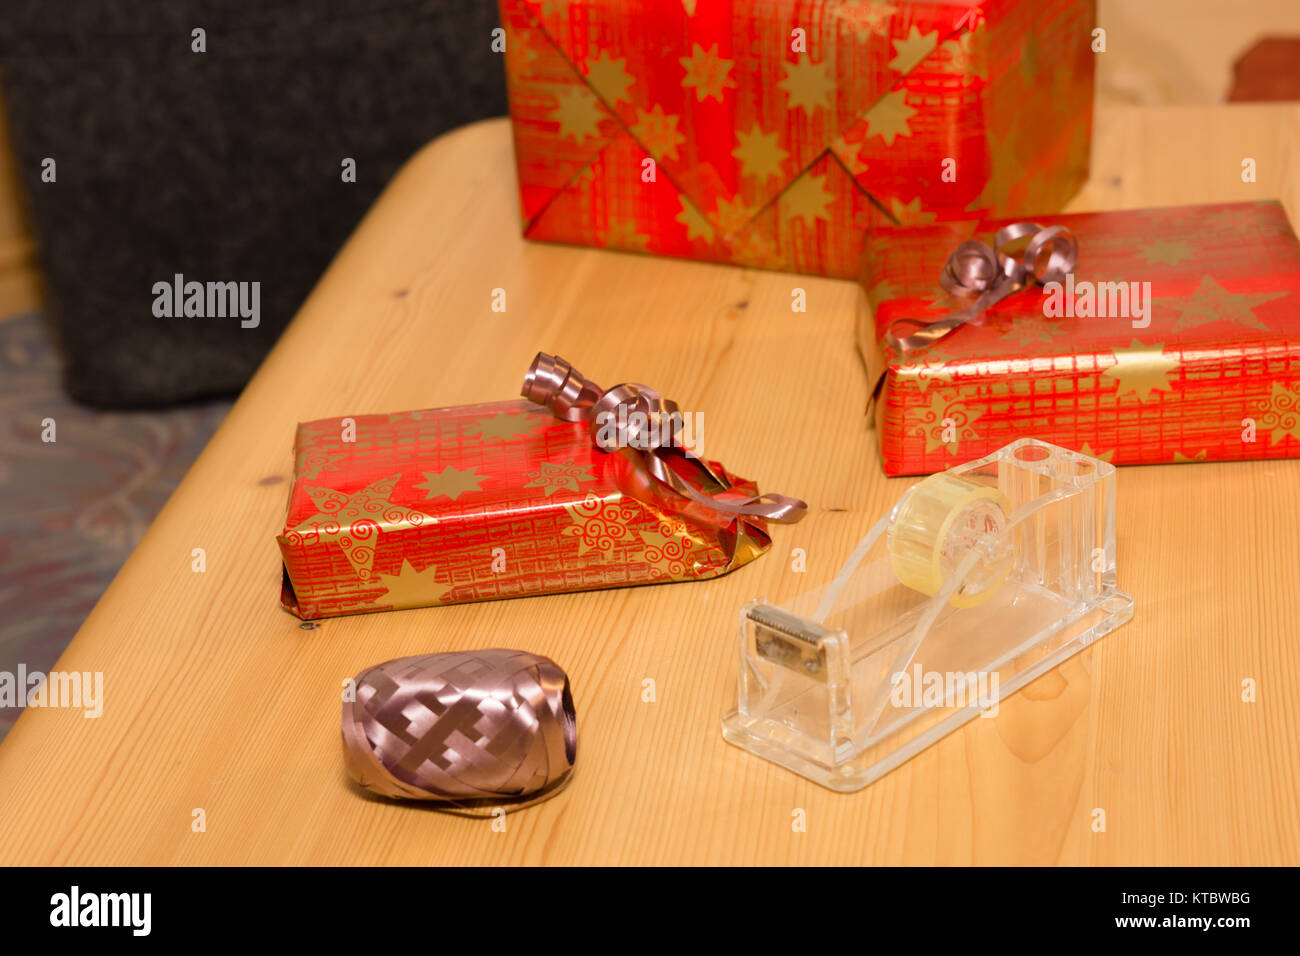 Gag Geschenke Stockfotos & Gag Geschenke Bilder - Alamy